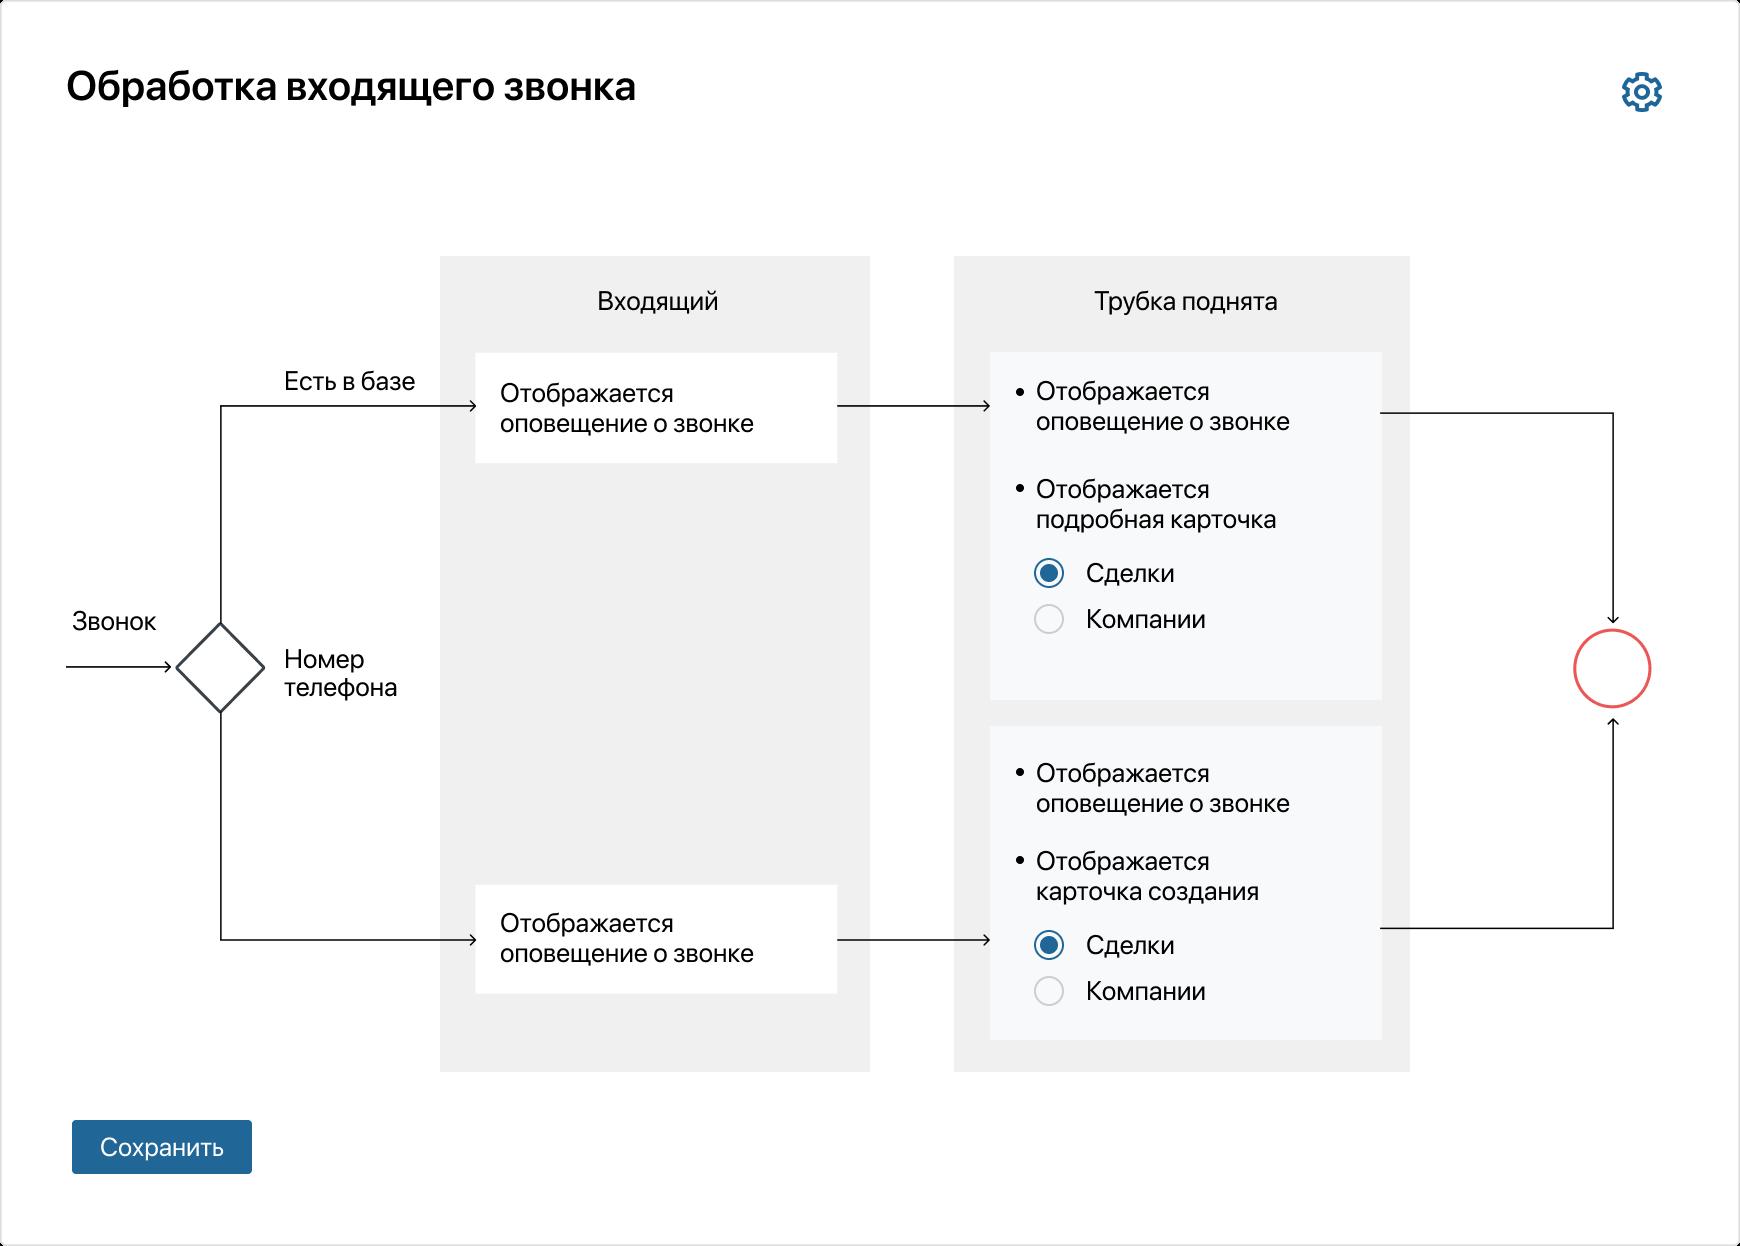 CRM-система ELMA365 на BPM платформе